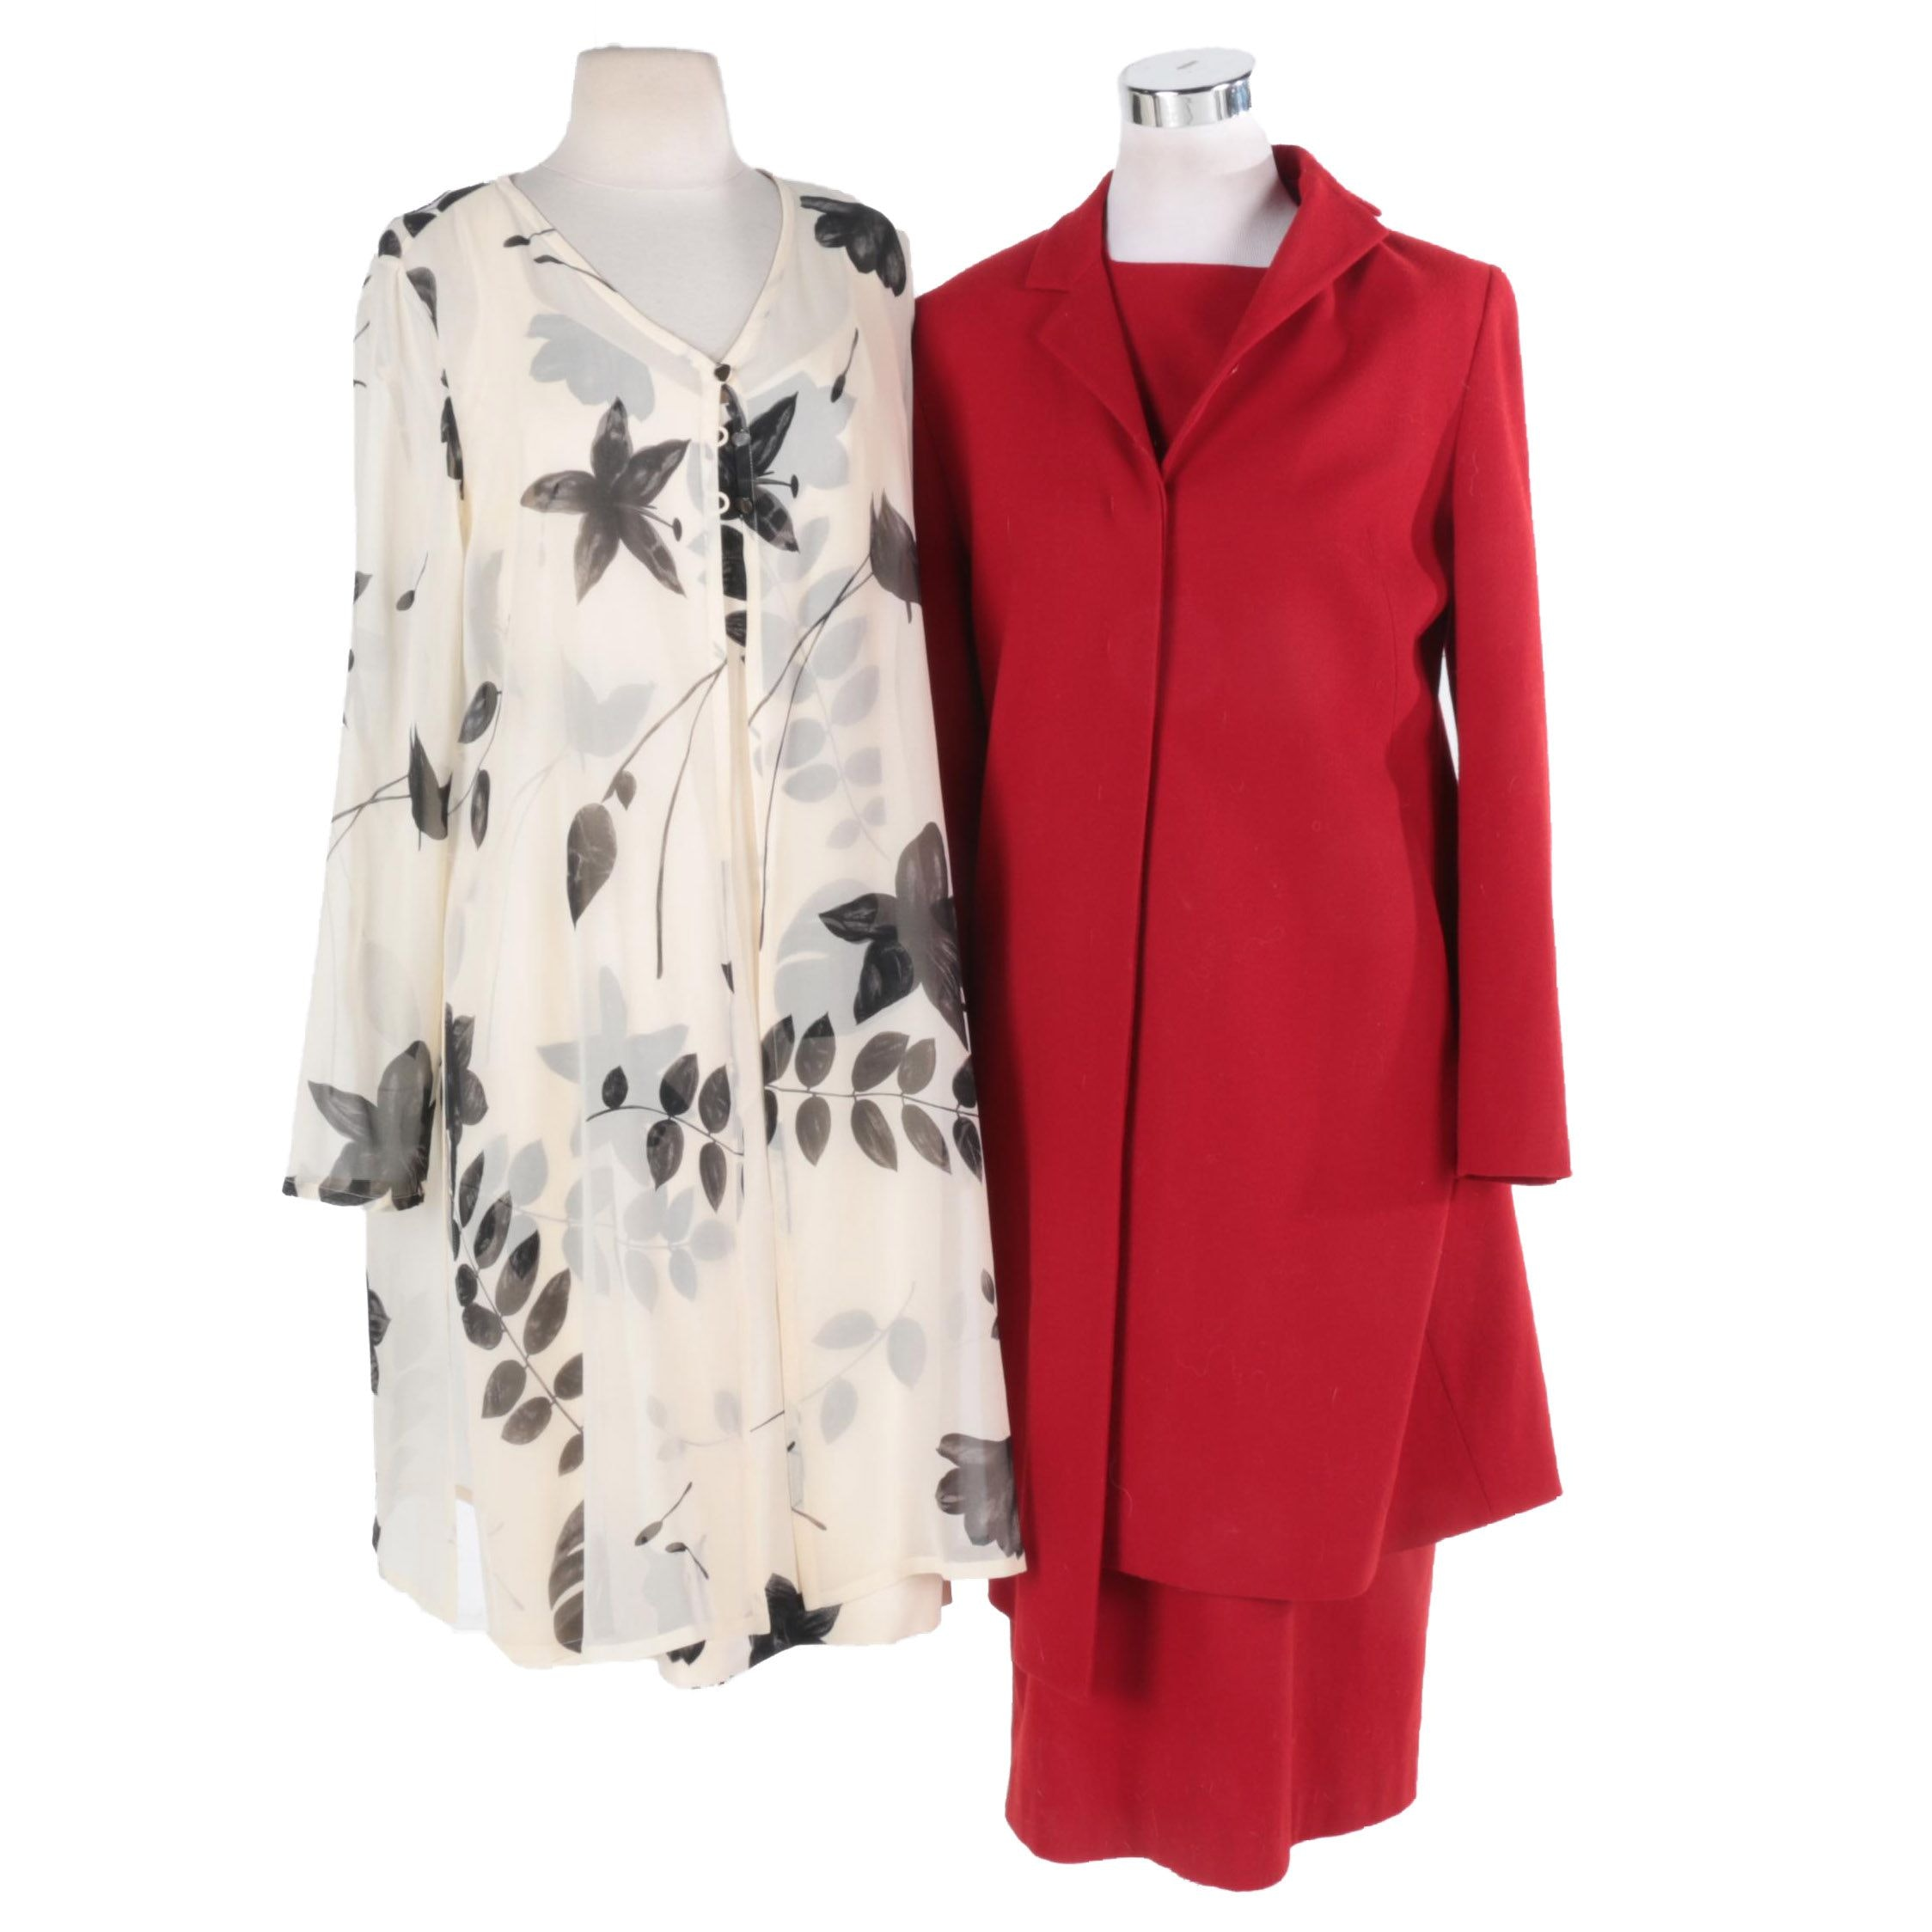 Dana Buchman Silk and Anne Klein Wool Dress Suits